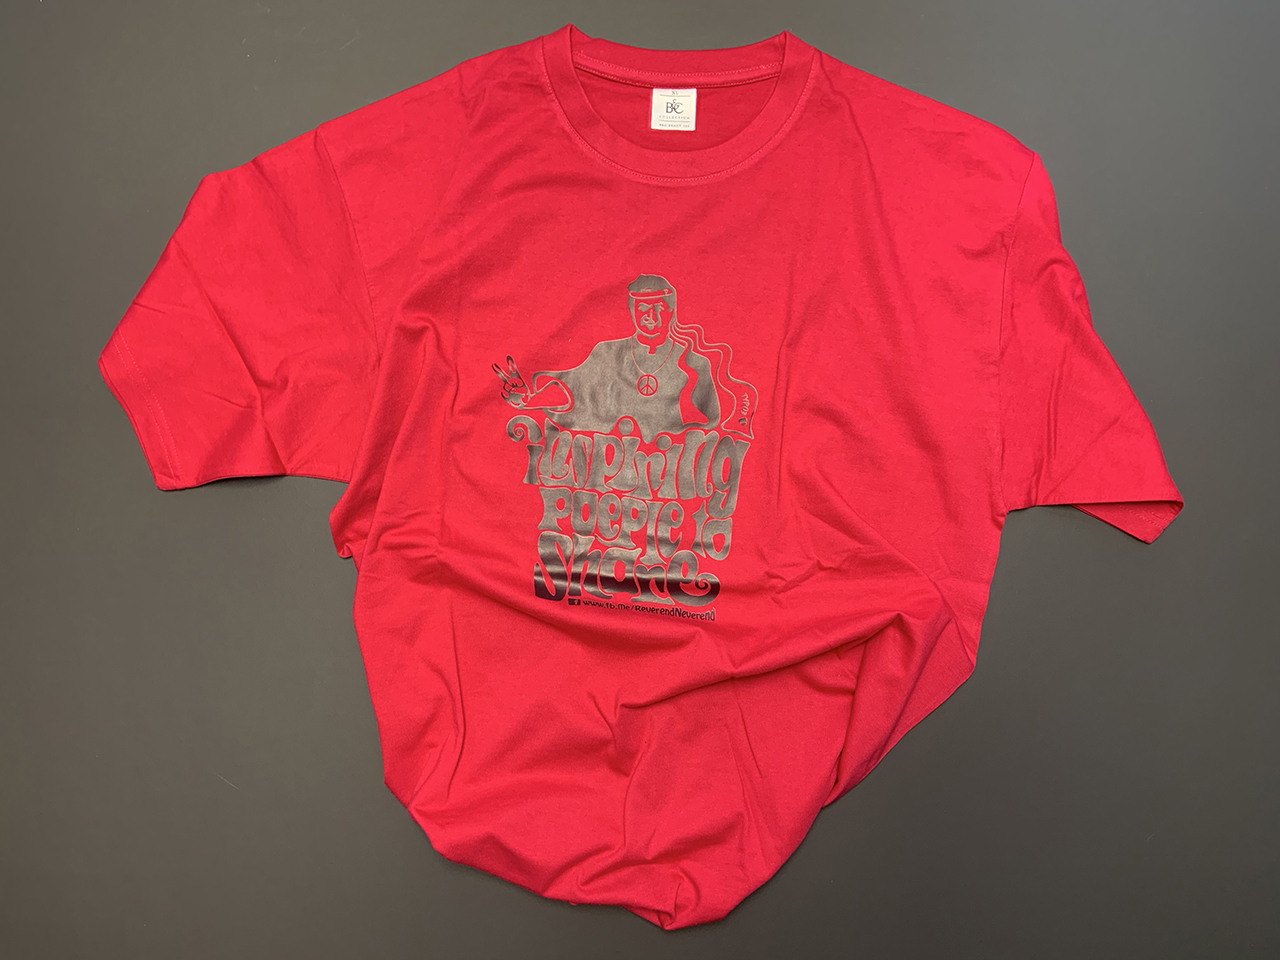 "Pinkes ""Inspiring People to Share""-Shirt"